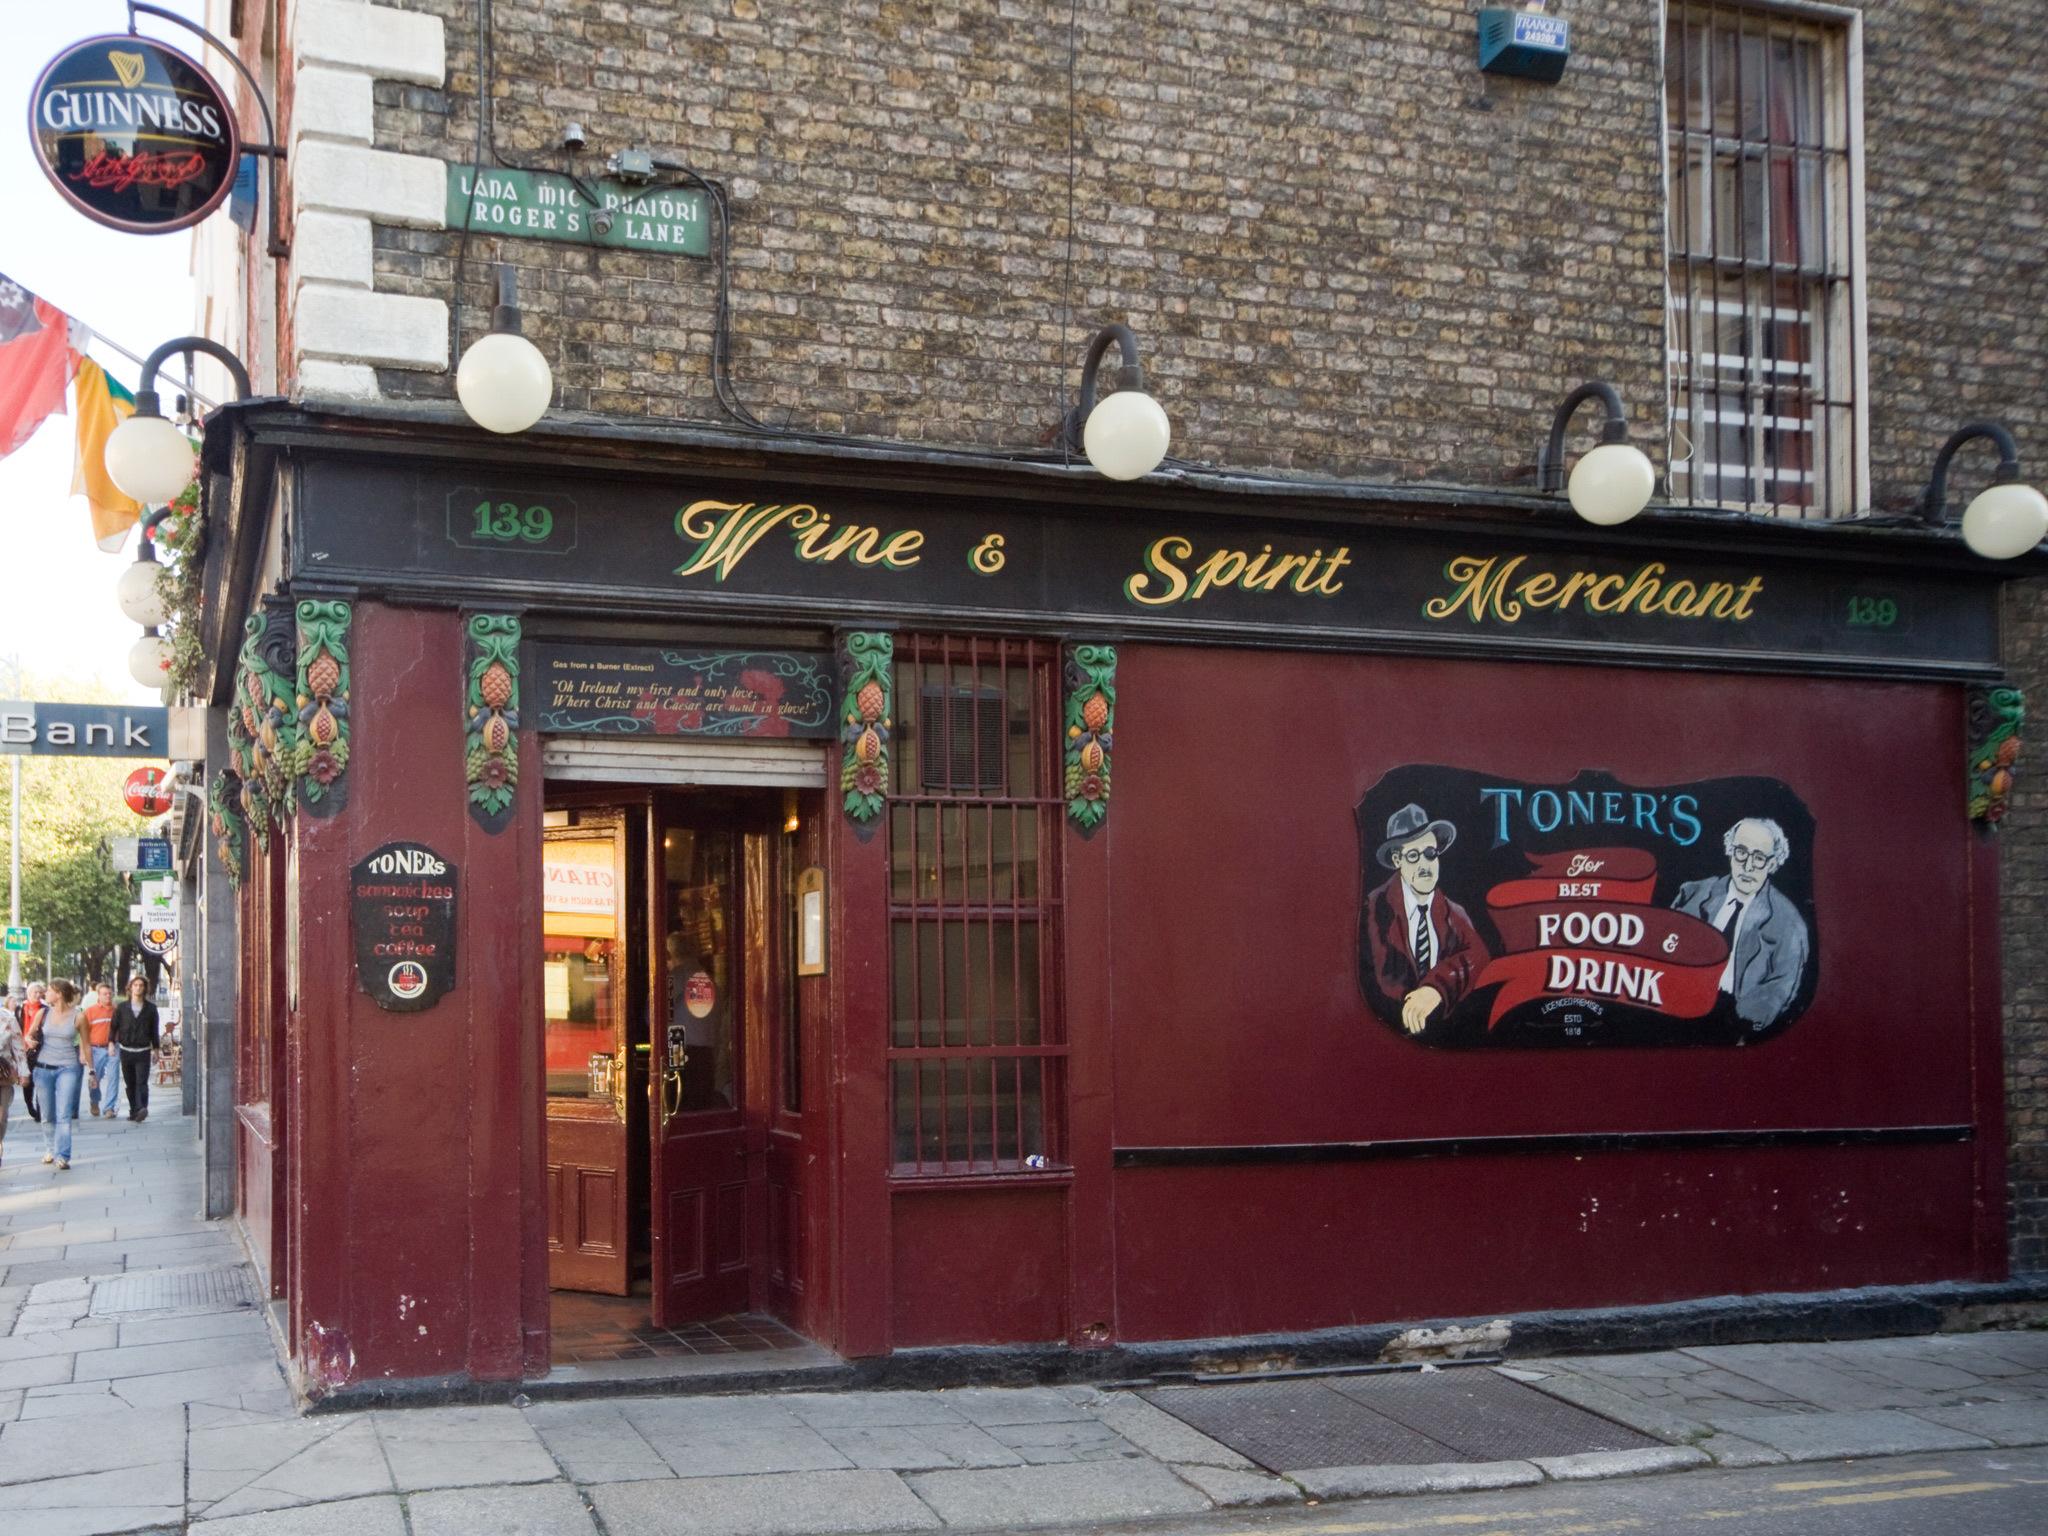 The exterior of Toners pub in Dublin